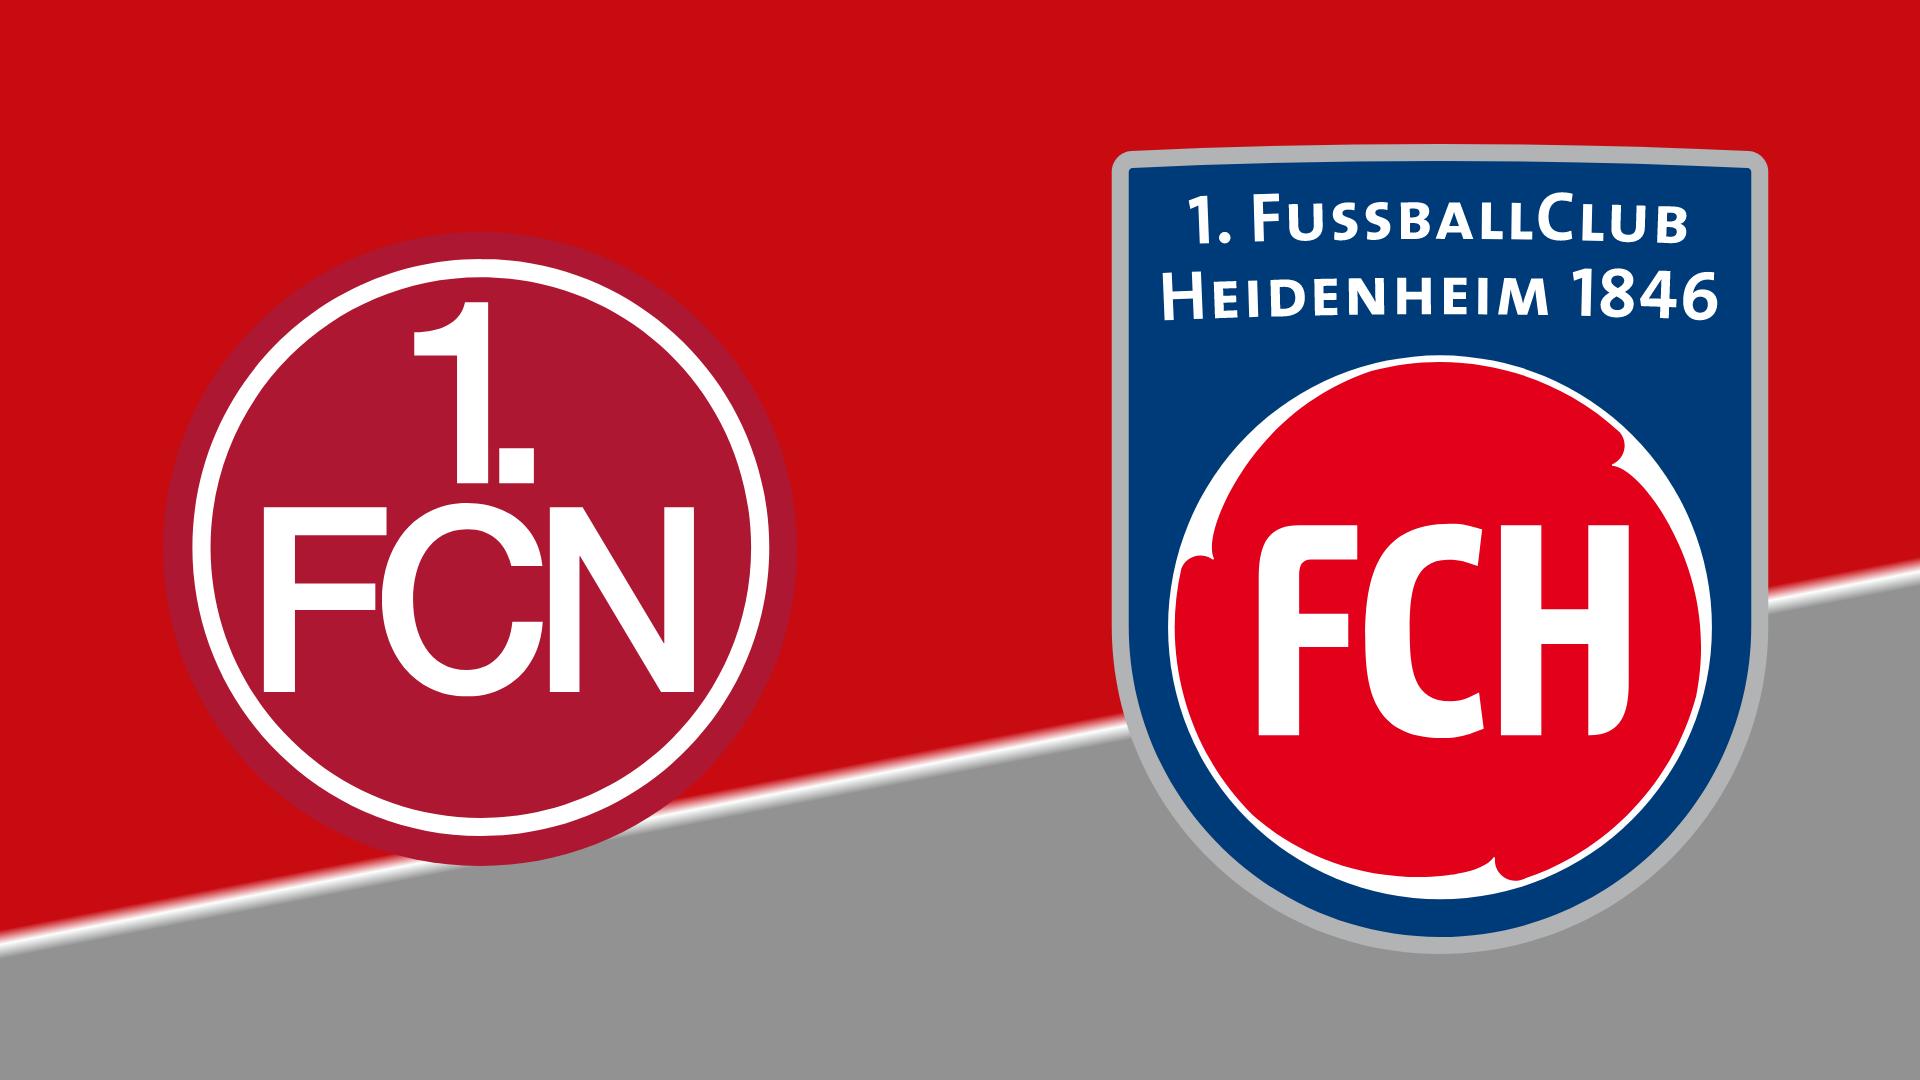 Live 2. BL: 1. FC Nürnberg - 1. FC Heidenheim, 11. Spieltag 23.10.2021 um 13:00 Uhr auf Sky Ticket